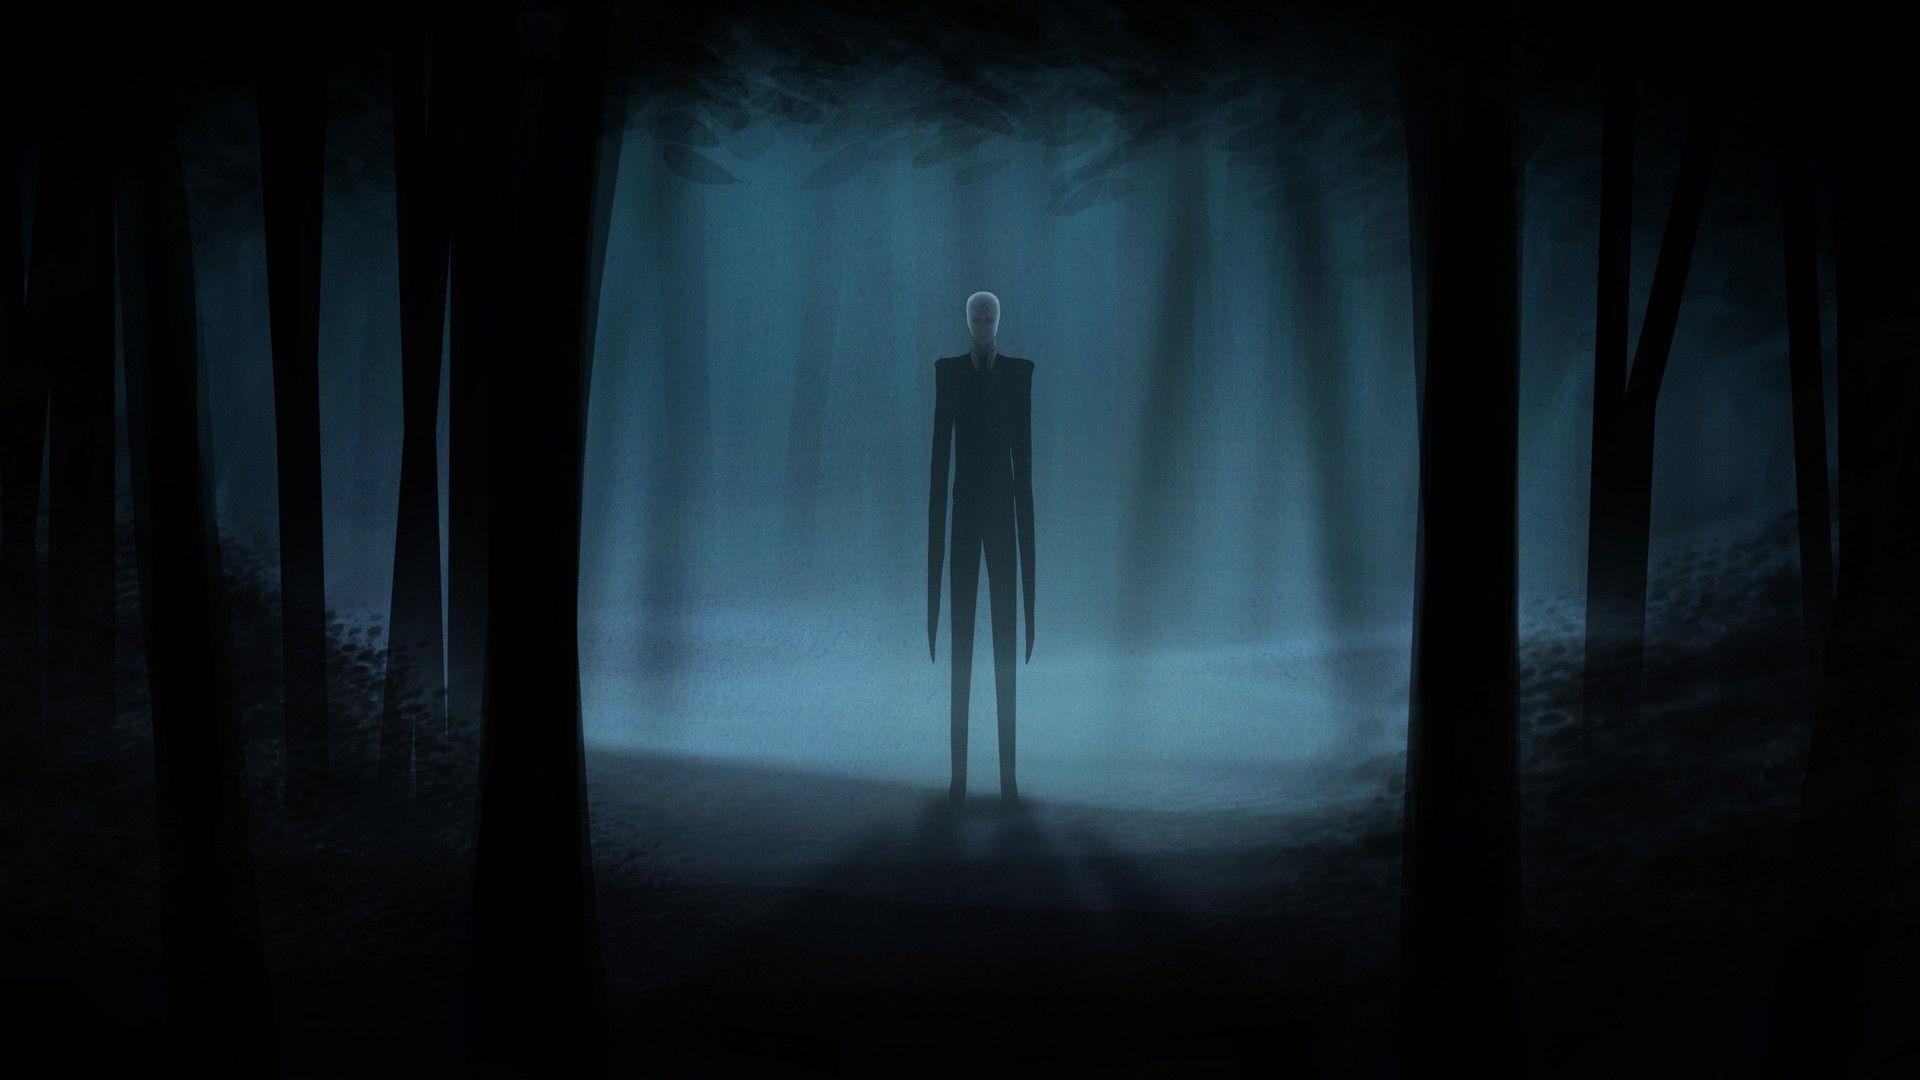 Slender Man Creepy Dark videogames dark horror trees forest .